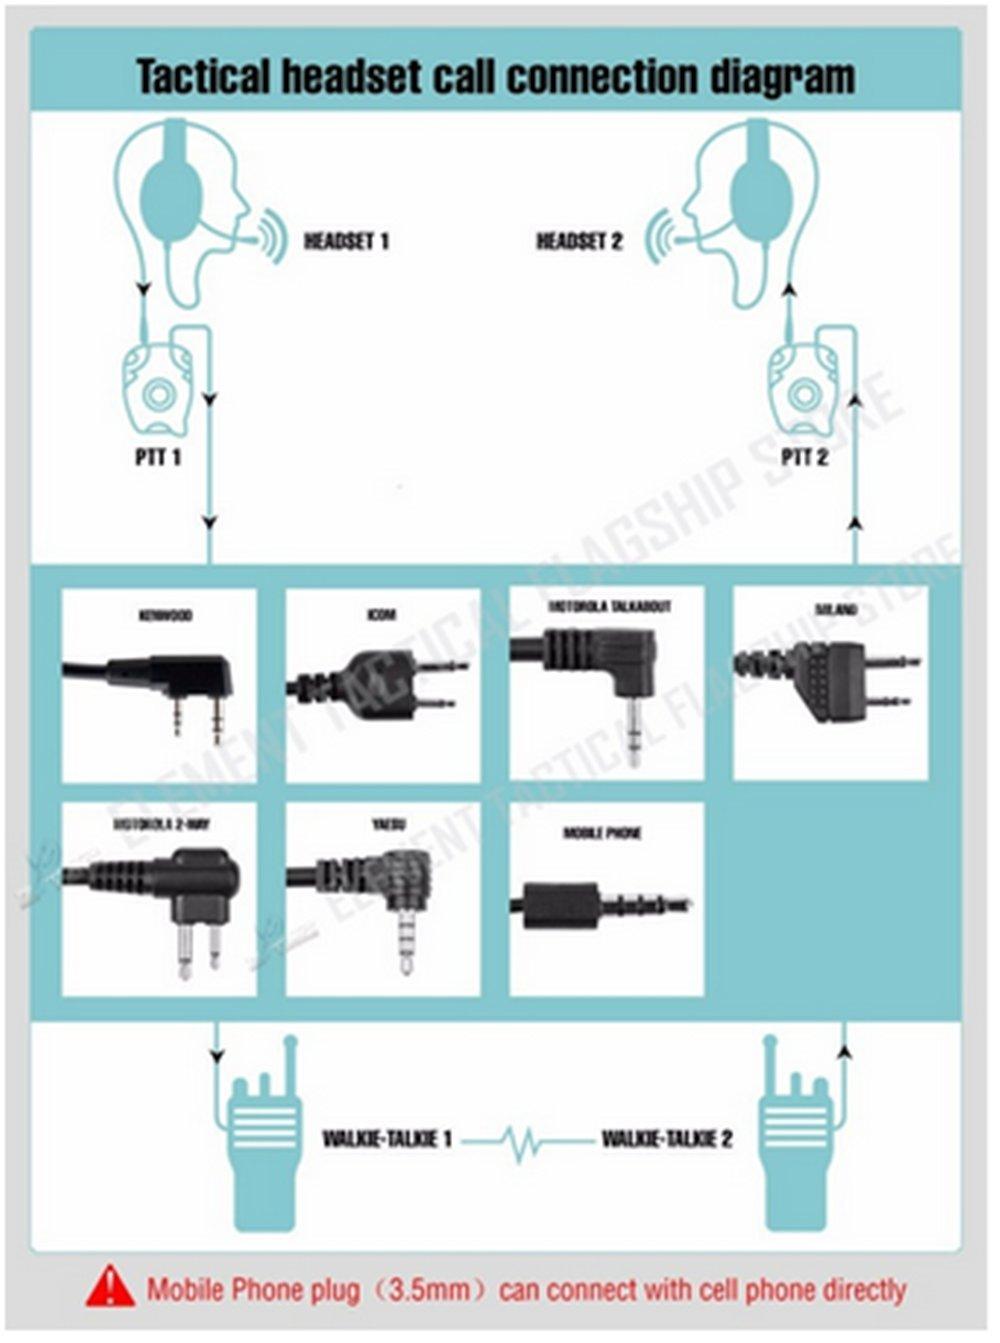 Tactical Bowman Elite Ii Hd01 Hd02 For Kenwood Midland Icom Computer Headset Wiring Diagram Ham Radio Walkie Talkie Airsoft Accessories Z113ptt With Headphones Adapter